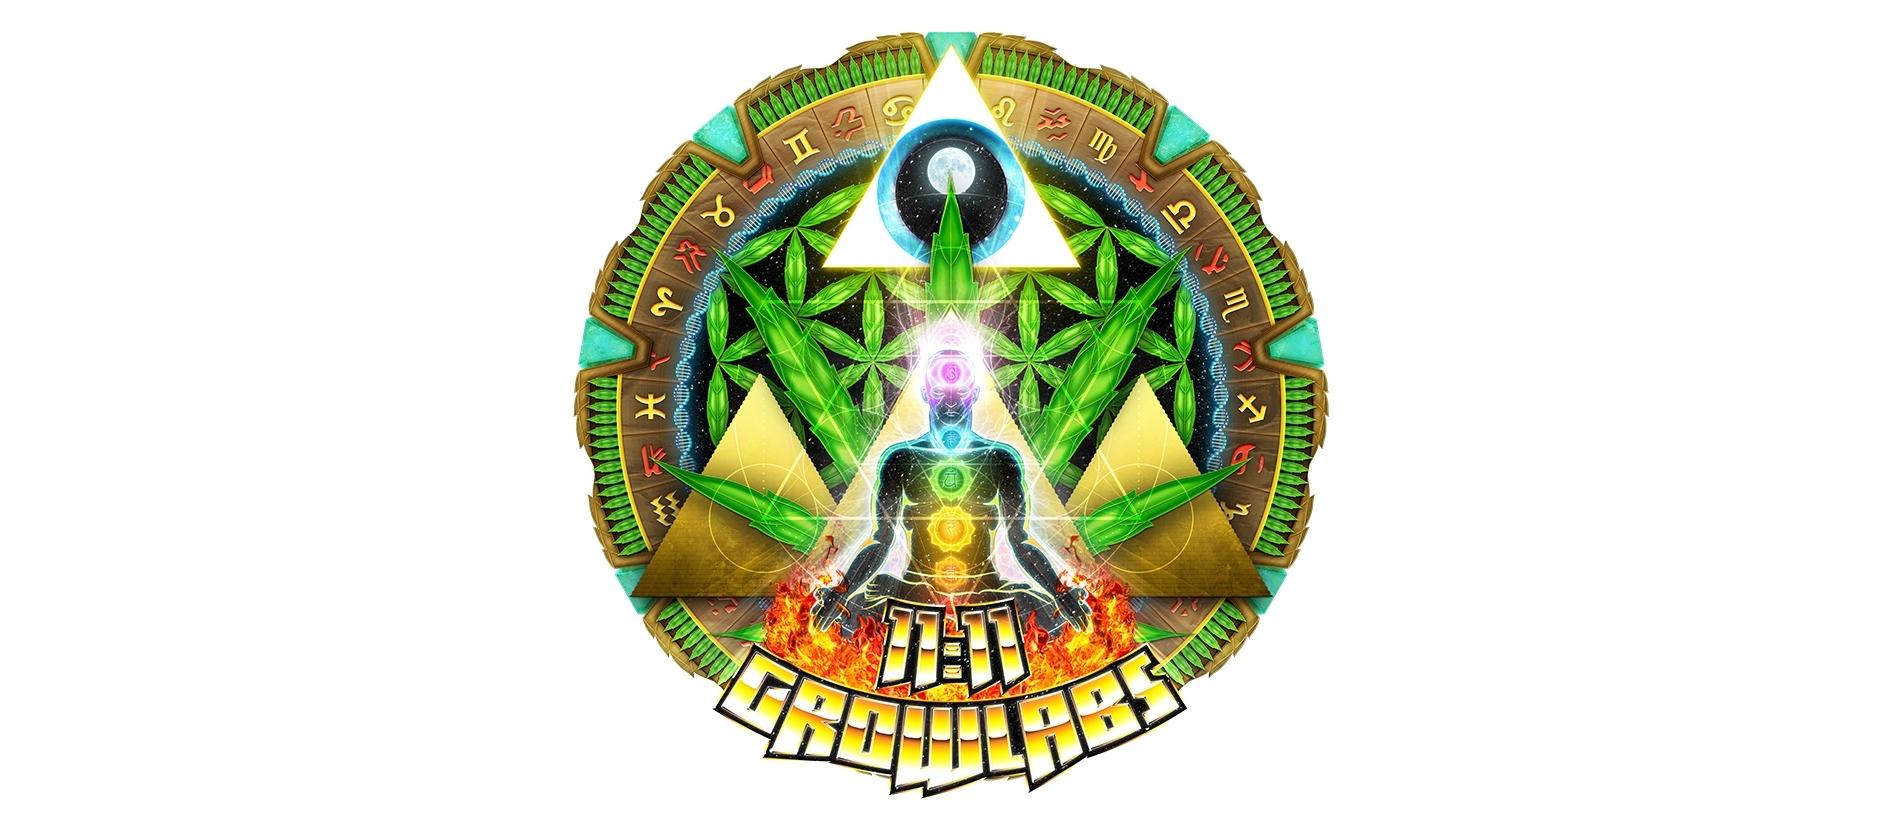 11:11 Growlabs Logo